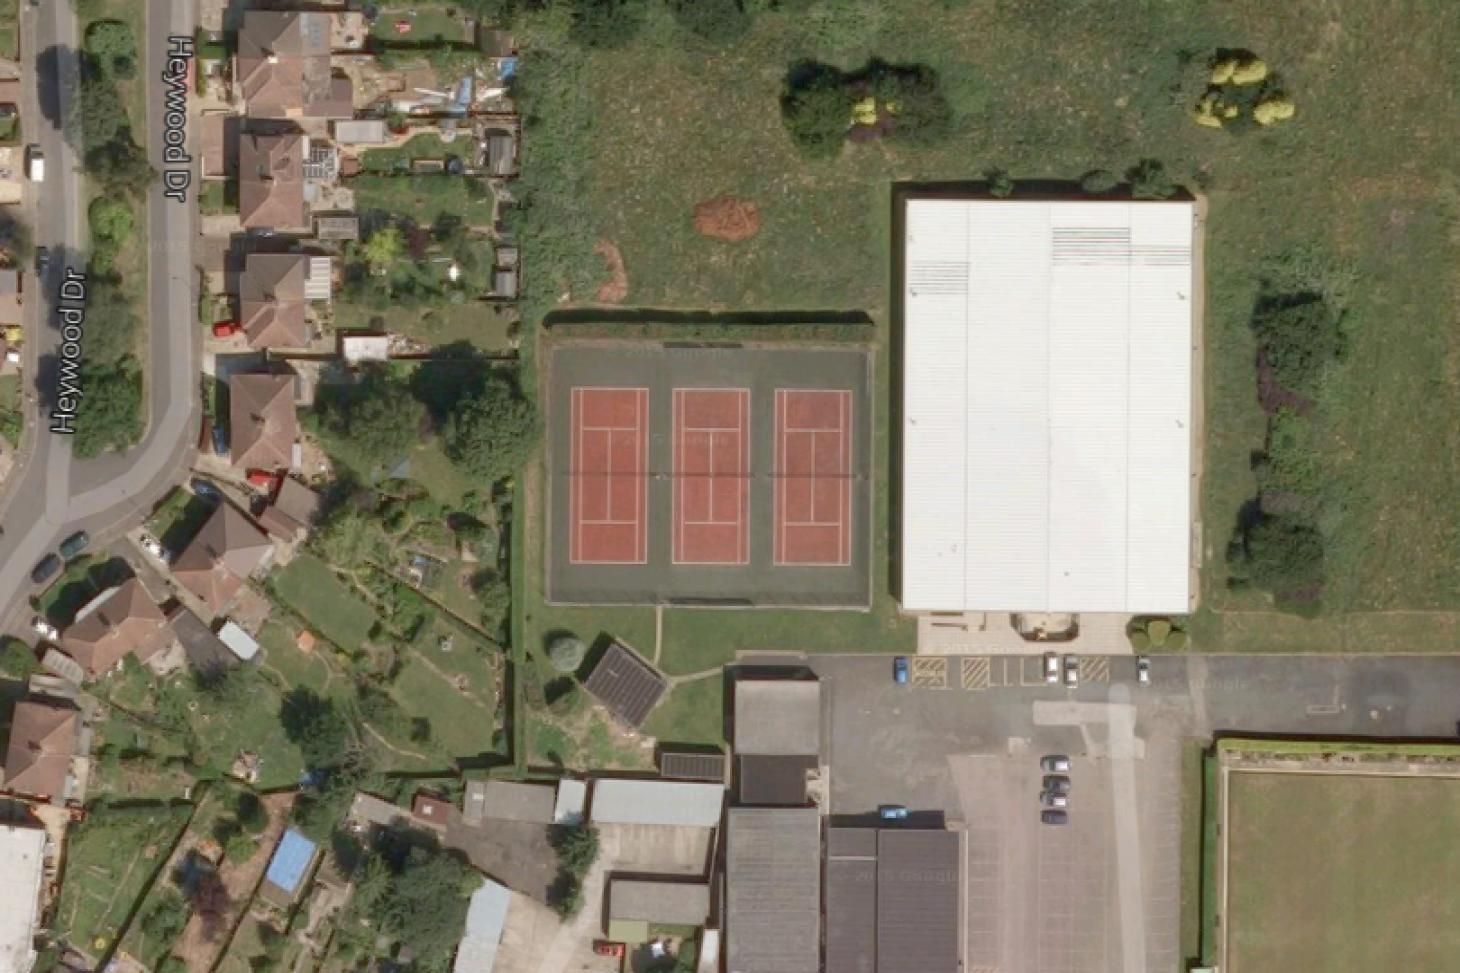 LICS Tennis Club (Luton Co-Op) Outdoor | Hard (macadam) tennis court